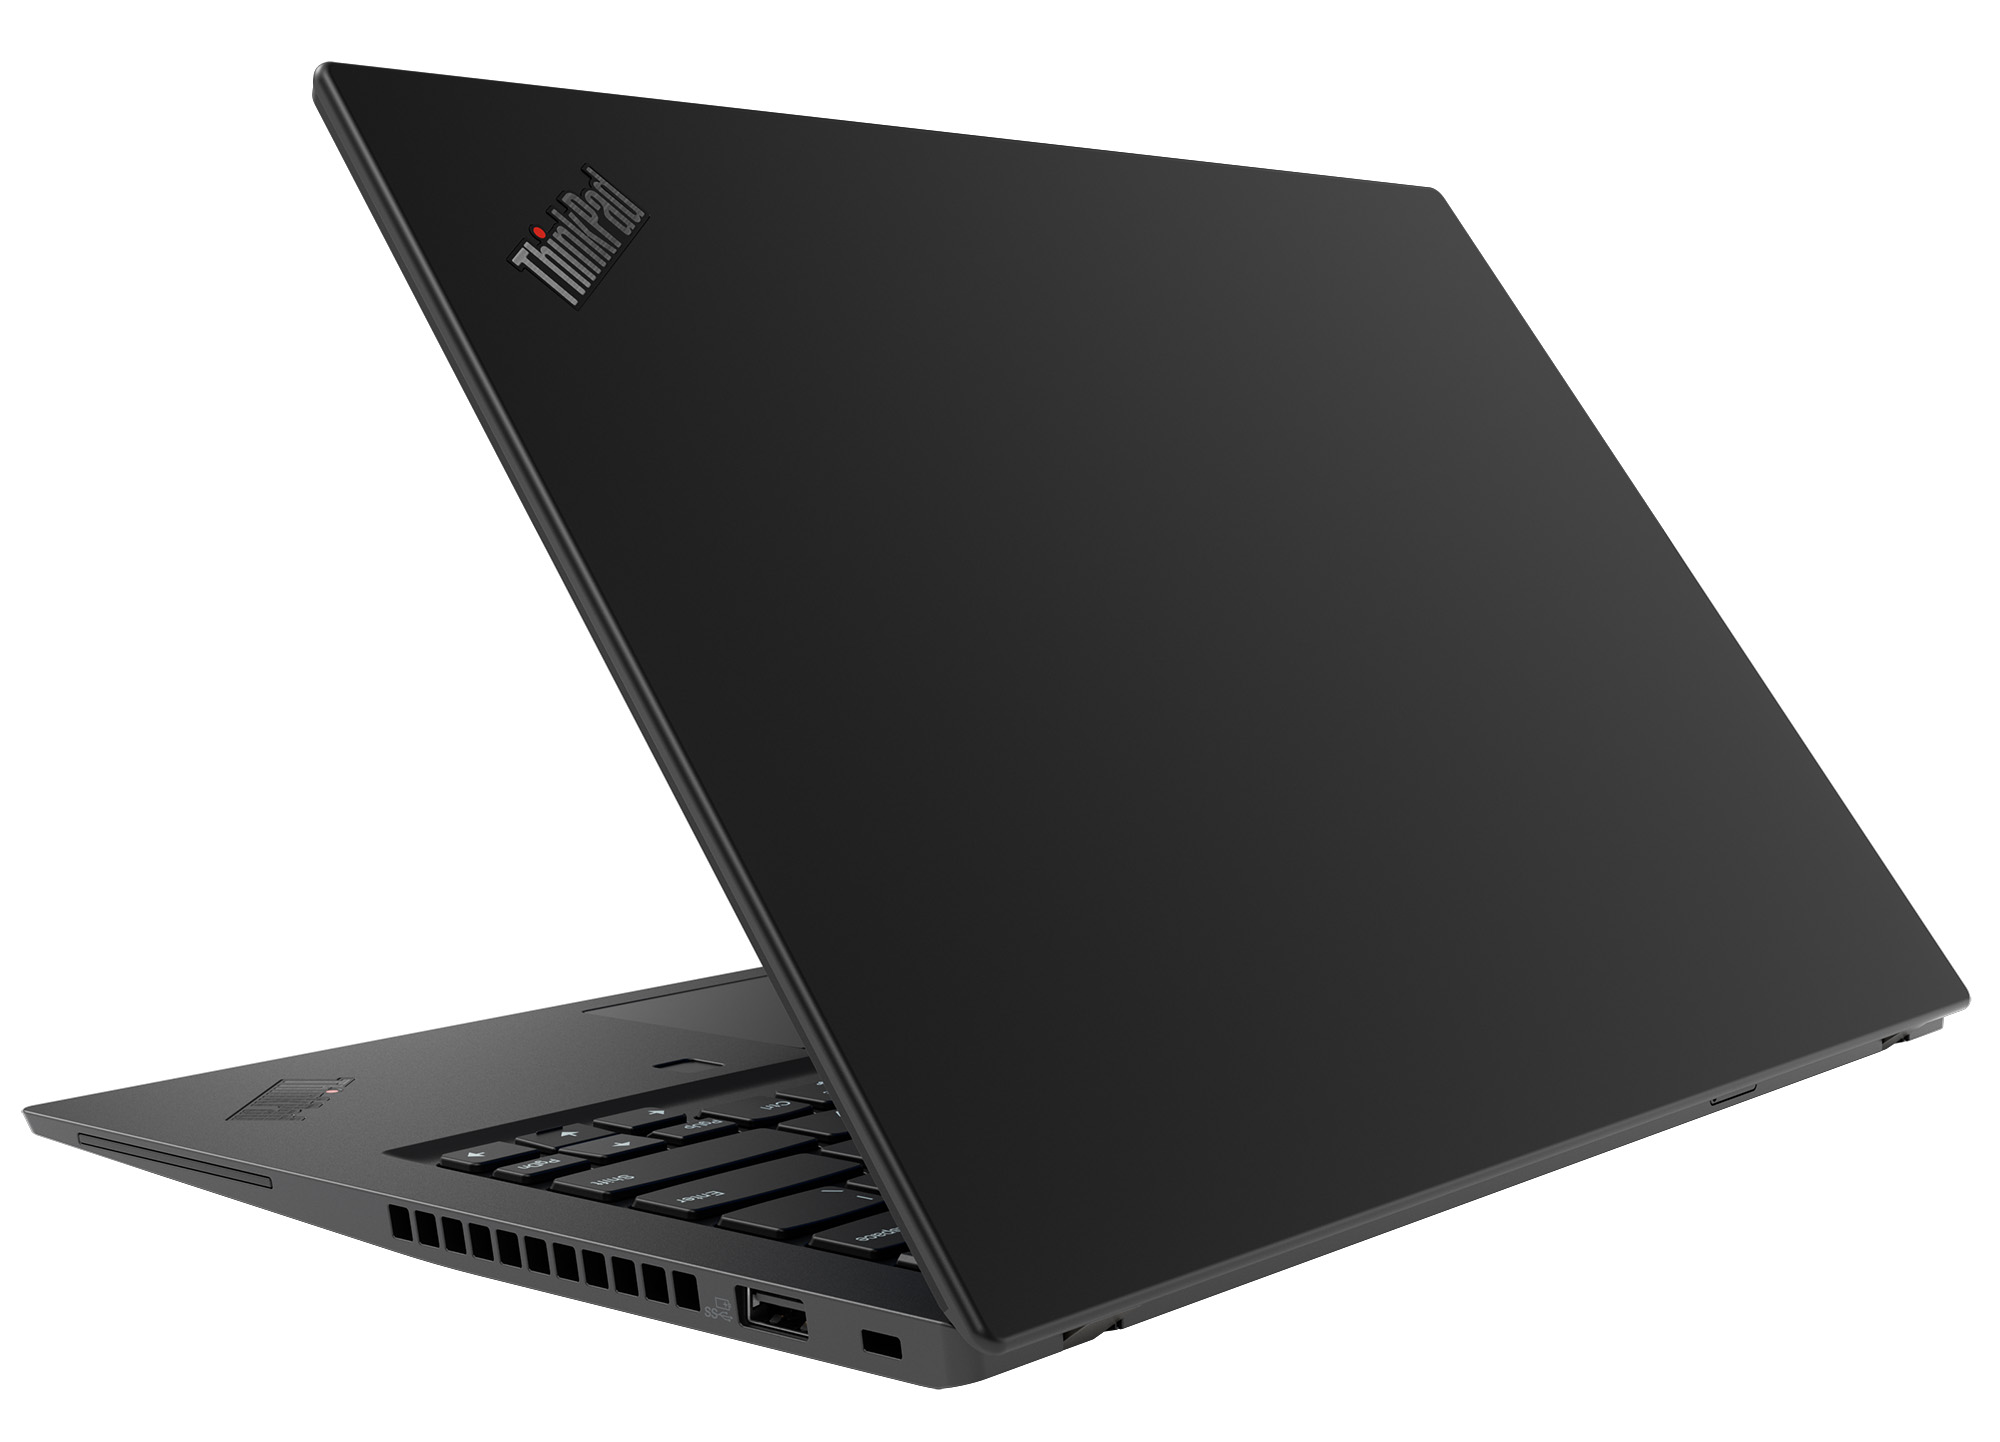 Фото  Ноутбук ThinkPad T14s 1st Gen (20T00020RT)